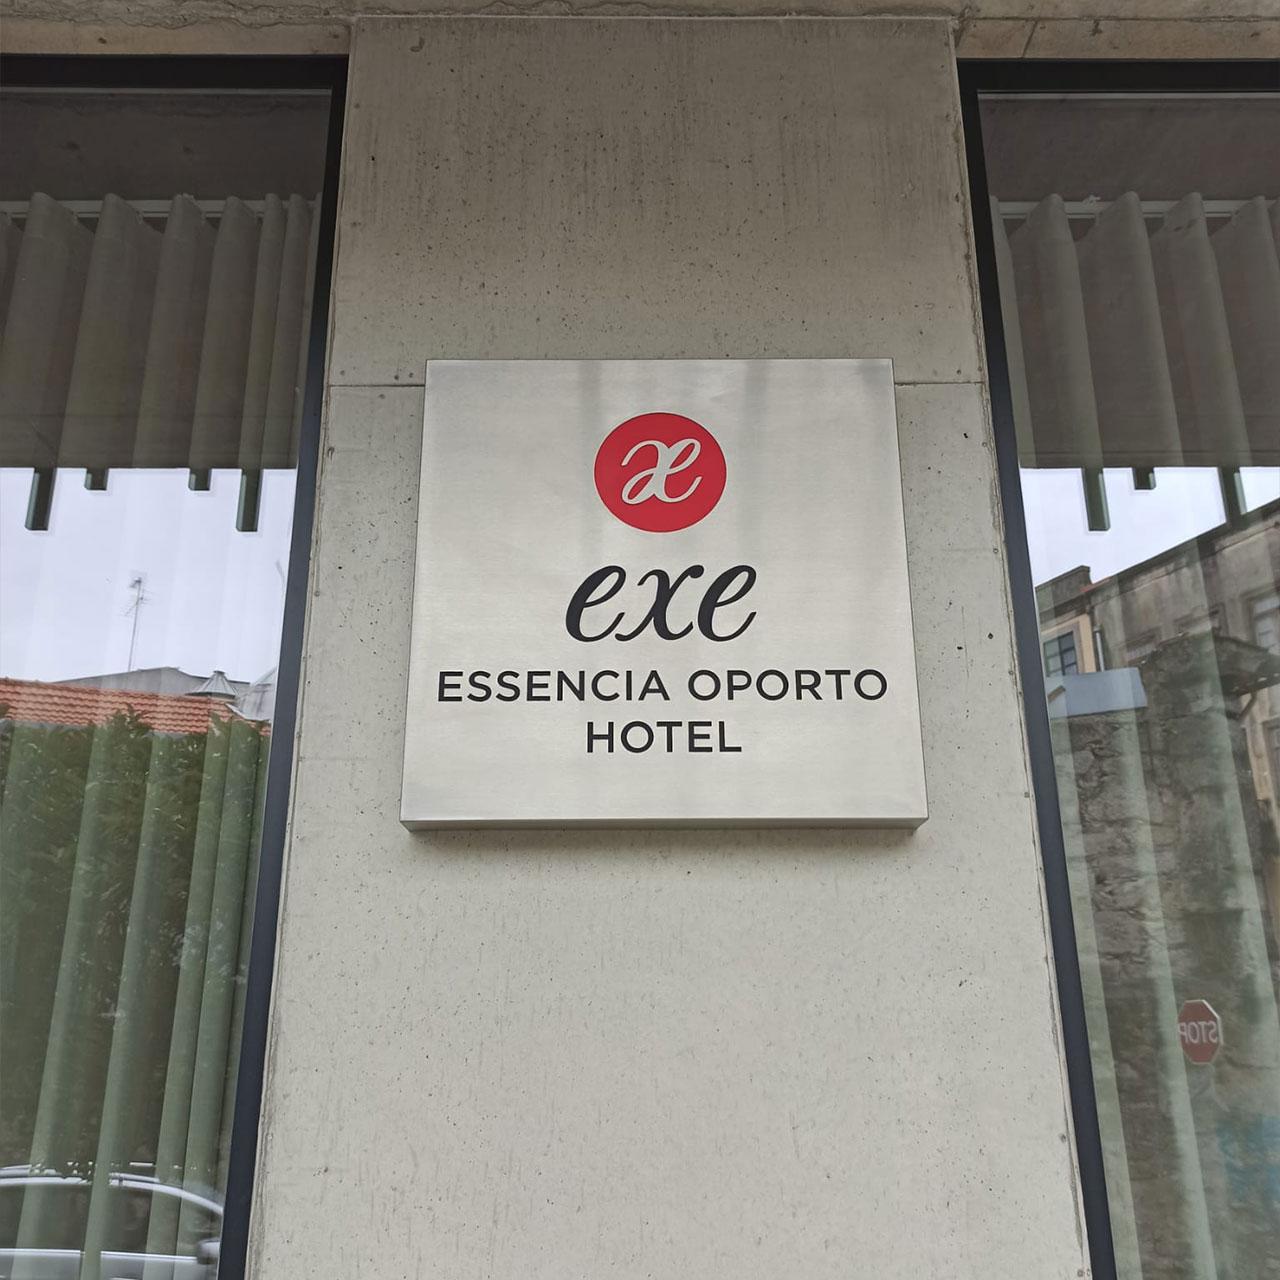 Hotel Exe Porto – Lettering